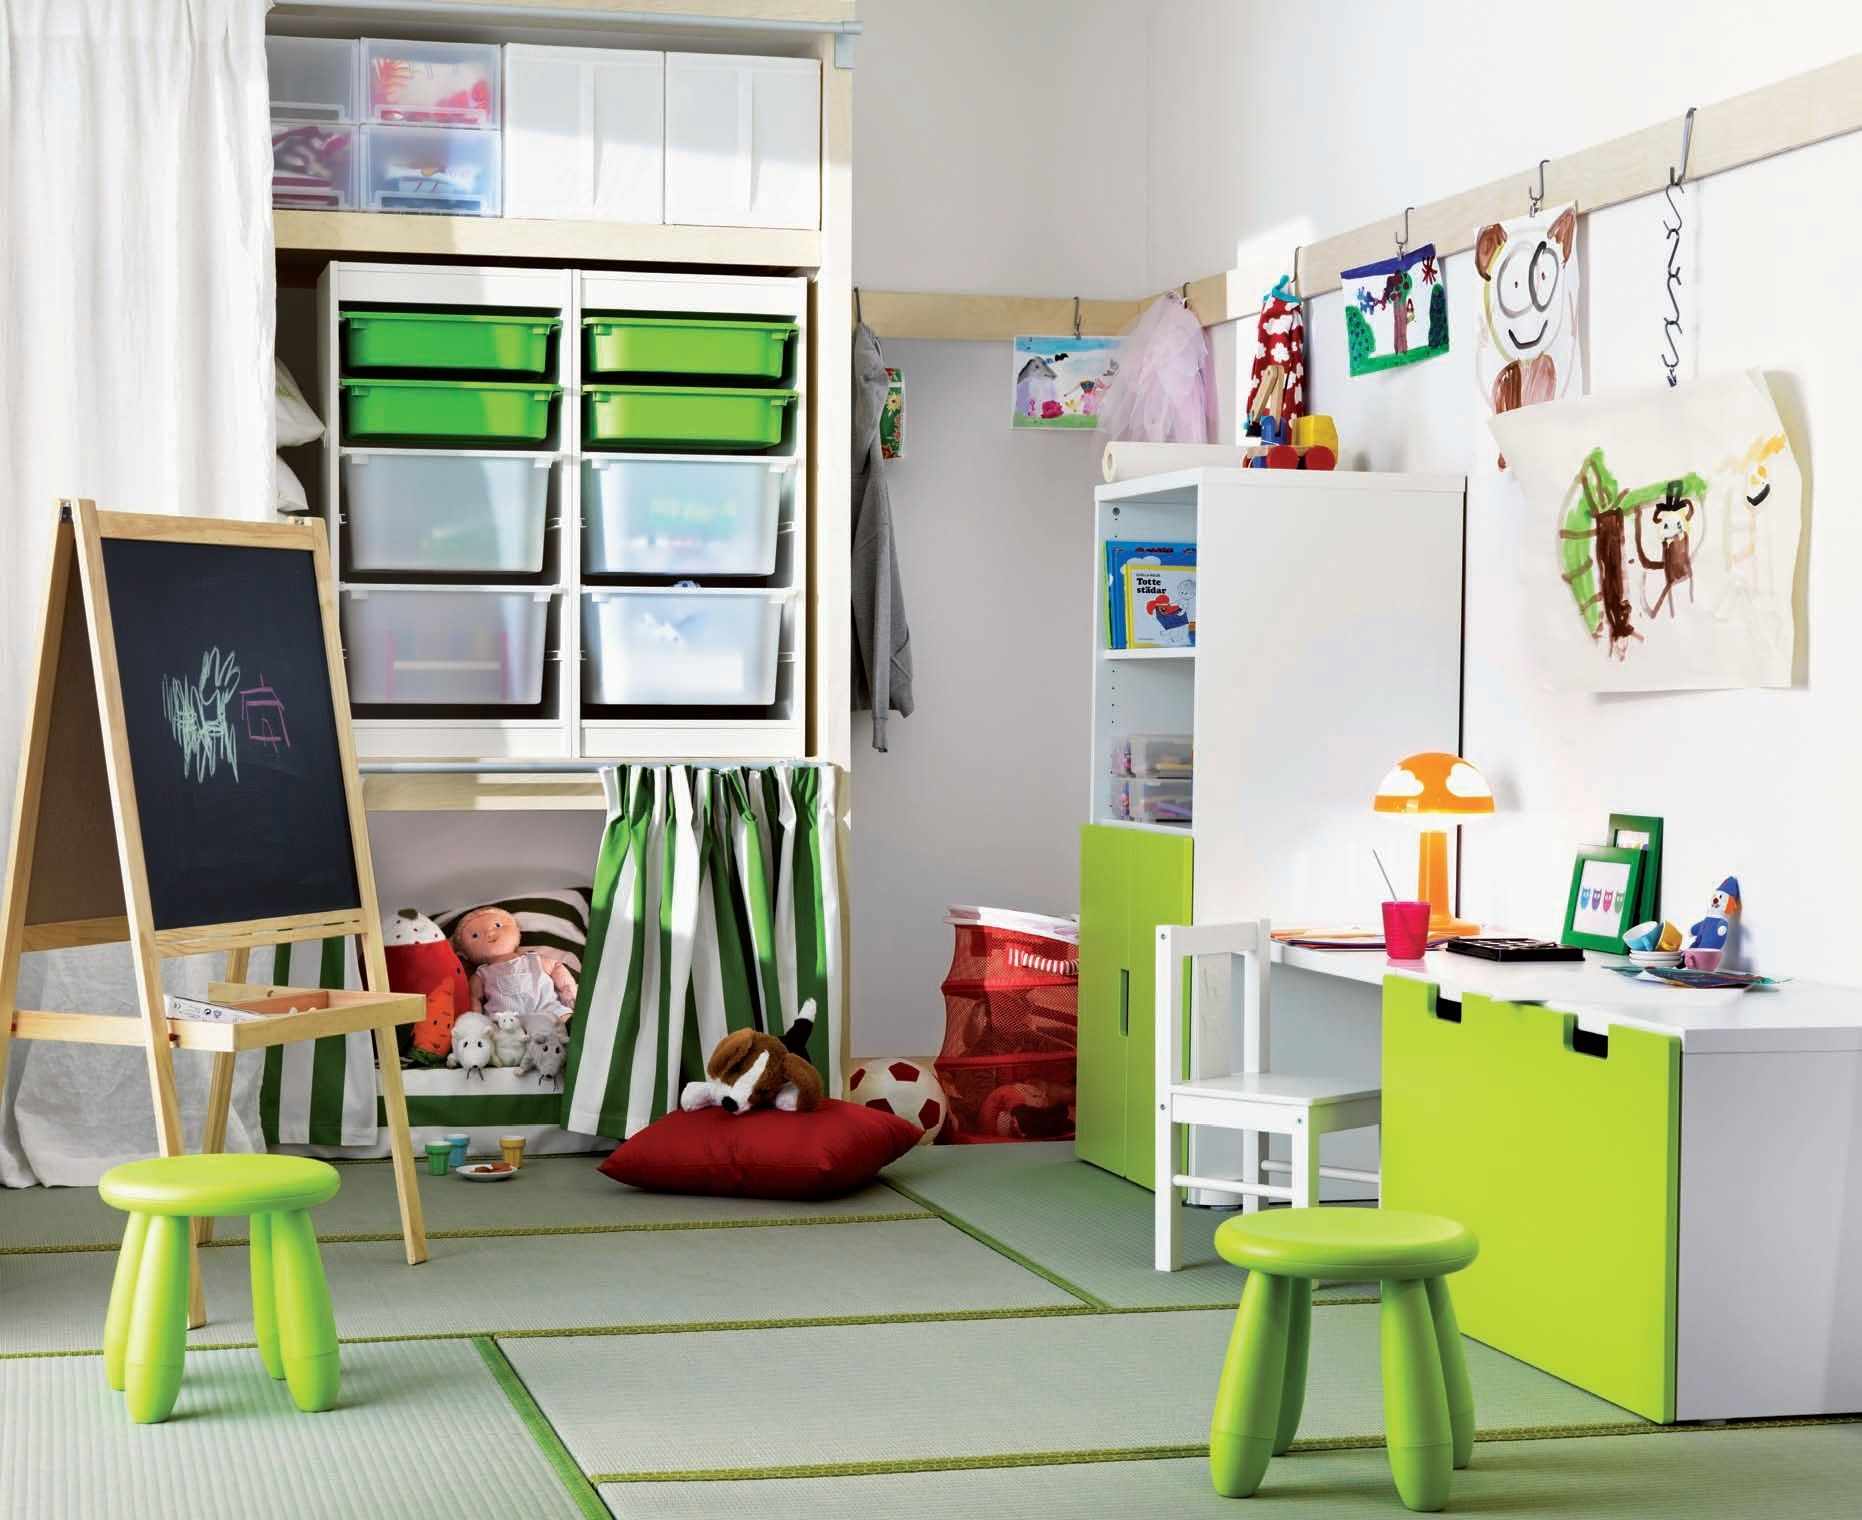 Ikea catalogo camas infantiles 34526 muebles ideas - Ikea cabecero infantil ...